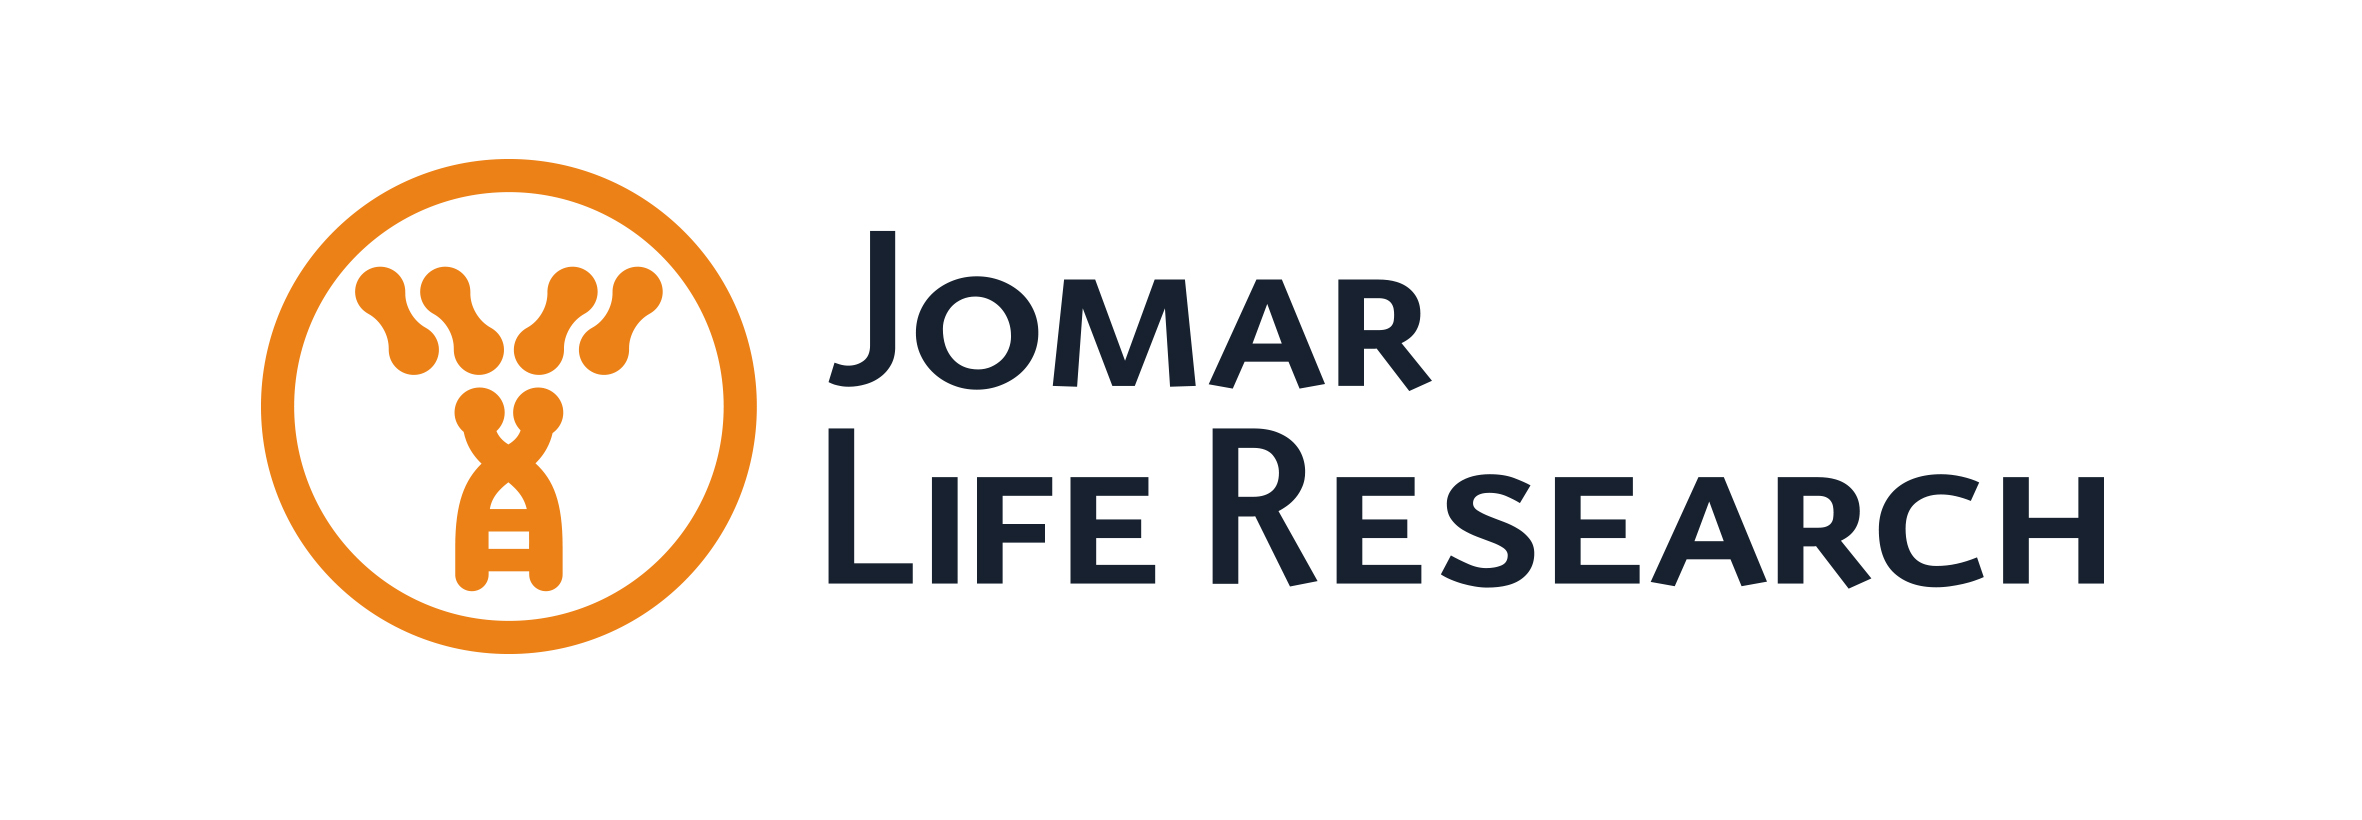 Jomar Life Research